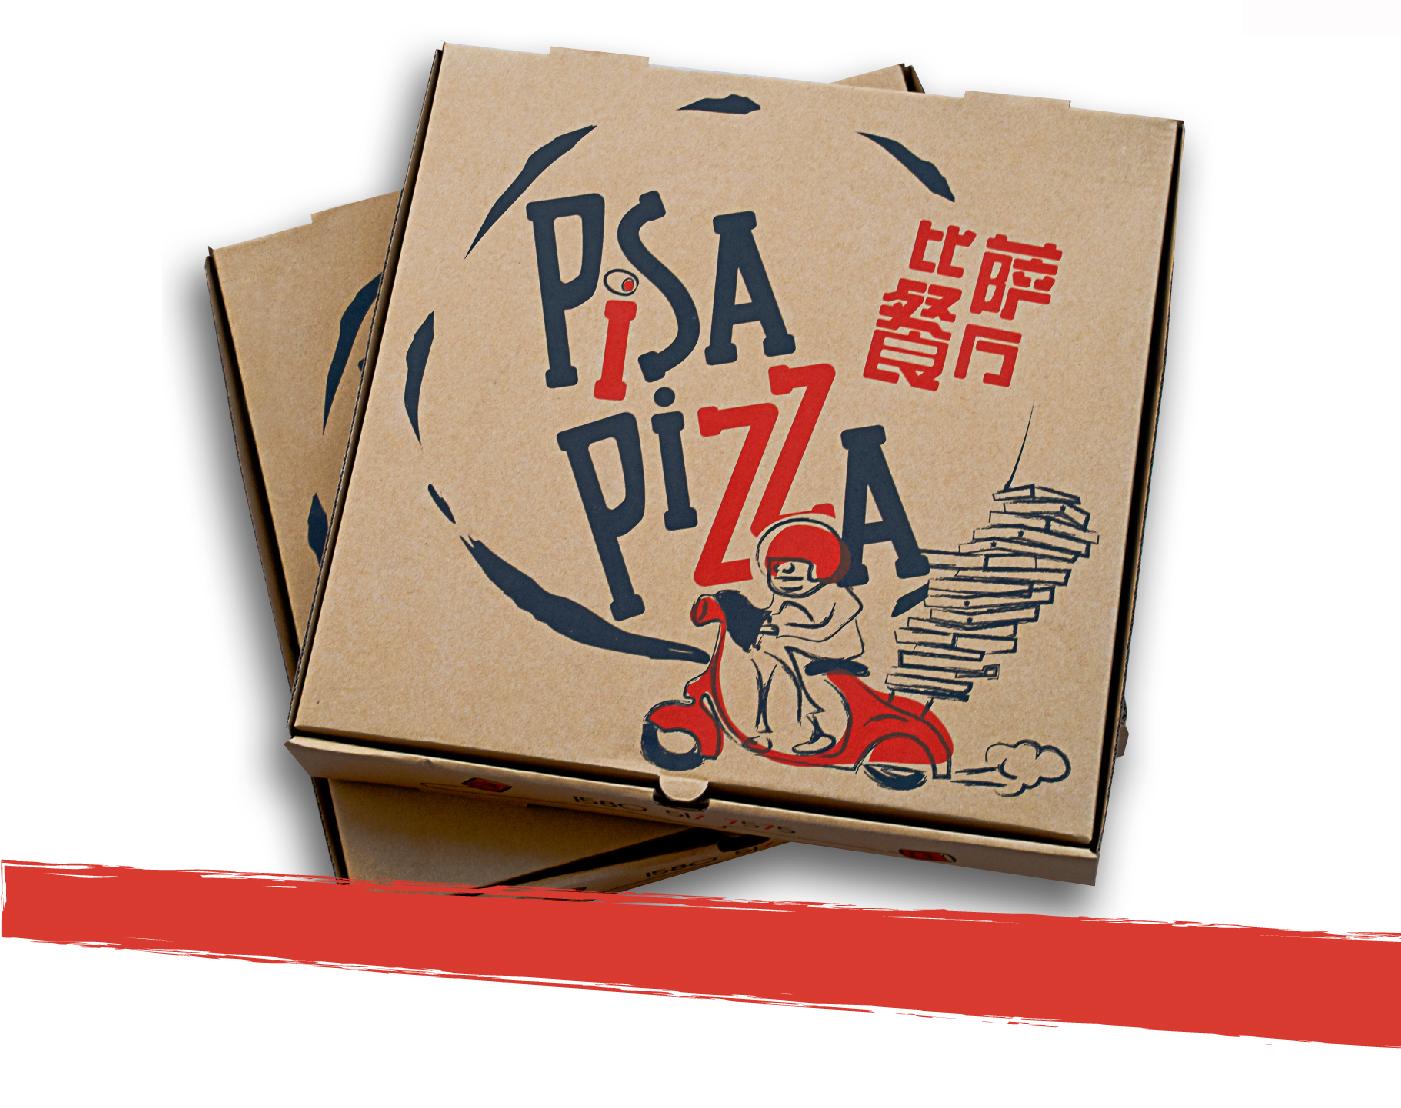 8-pisa-pizza_restaurant-boite_pizza_carton_logo_livraison_express.jpg